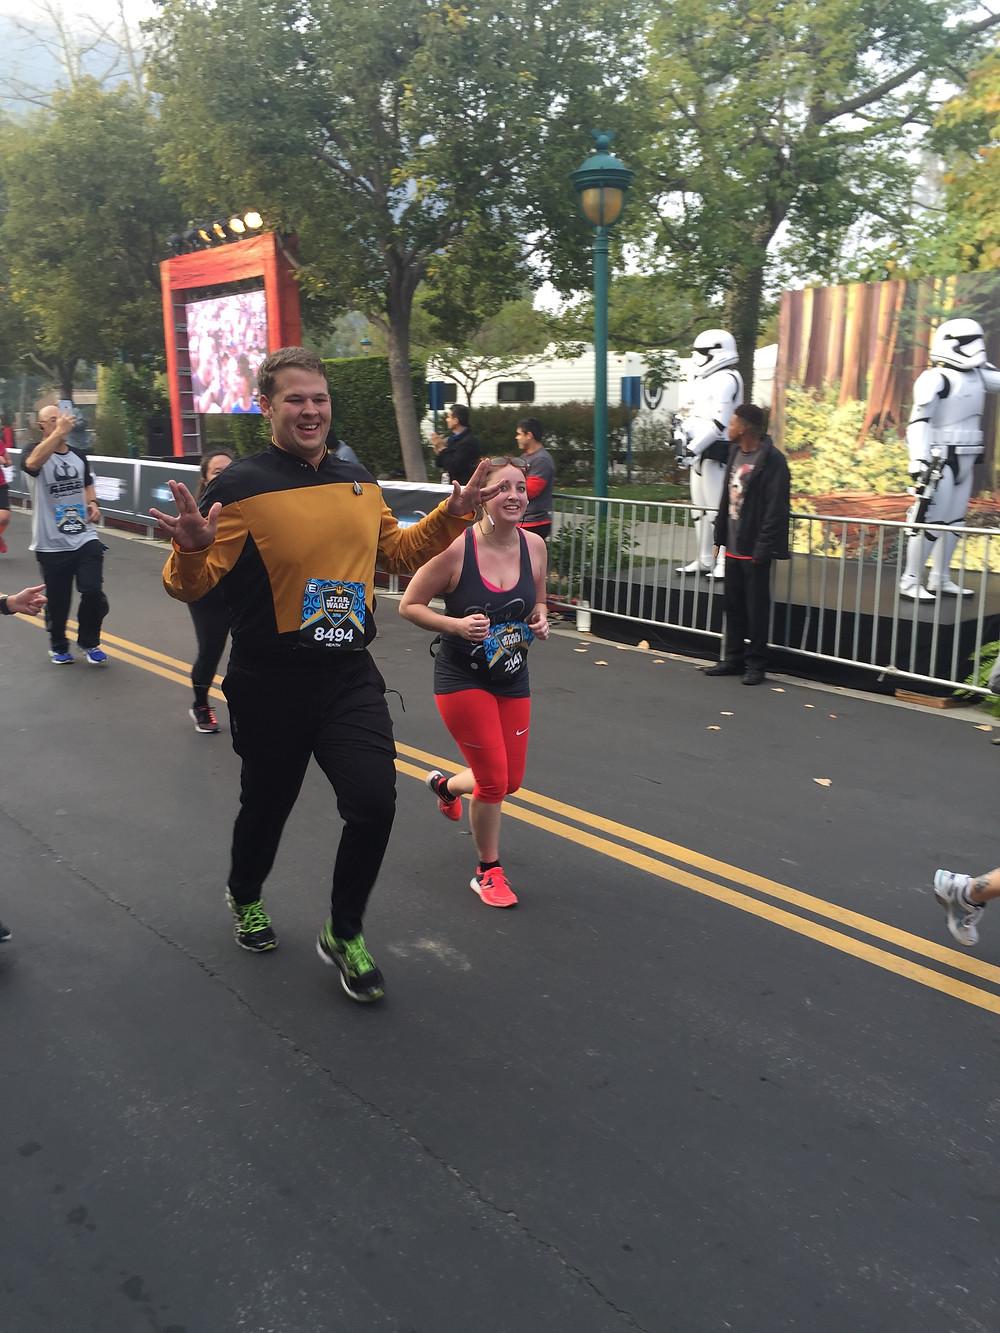 EscapeReno - runDisney Half Marathon at Disneyland